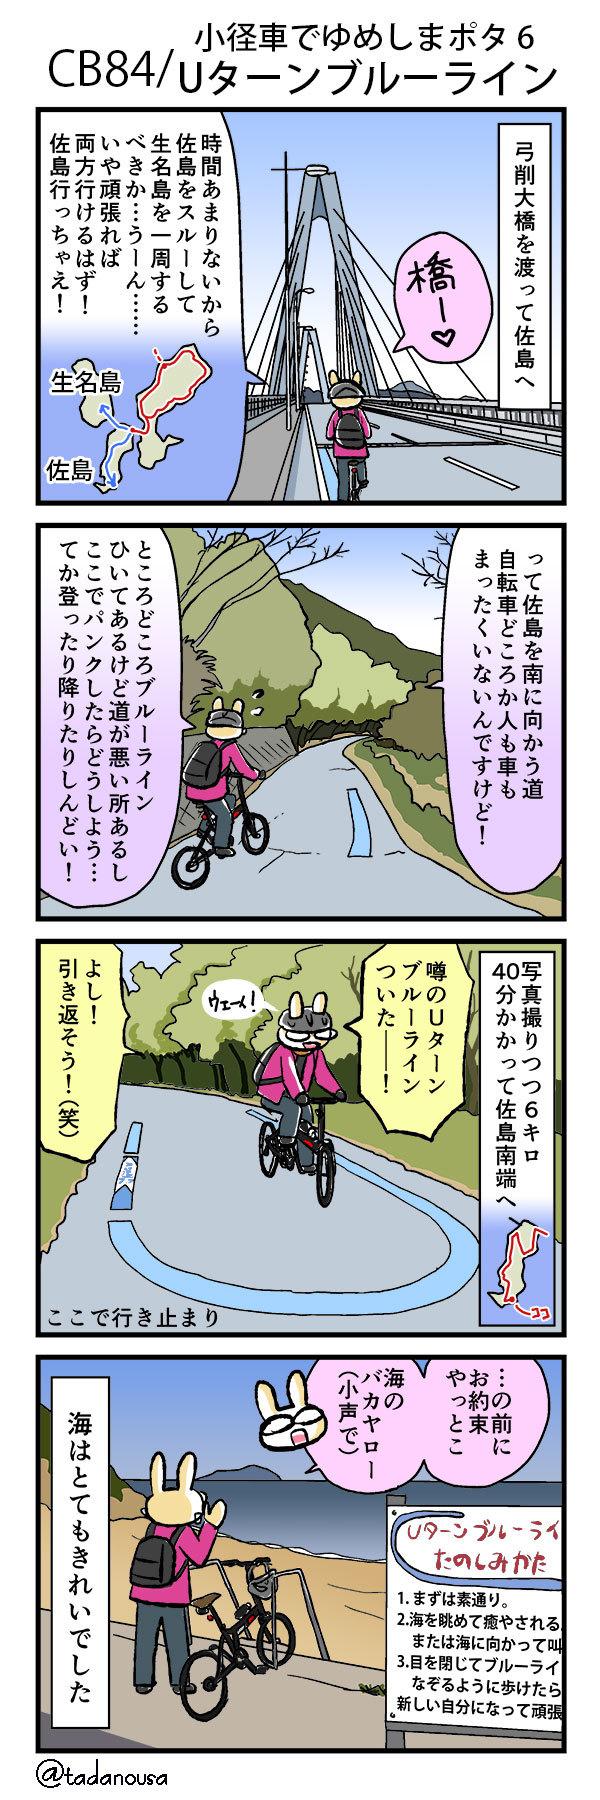 bike_4koma_kako124_s2.jpg